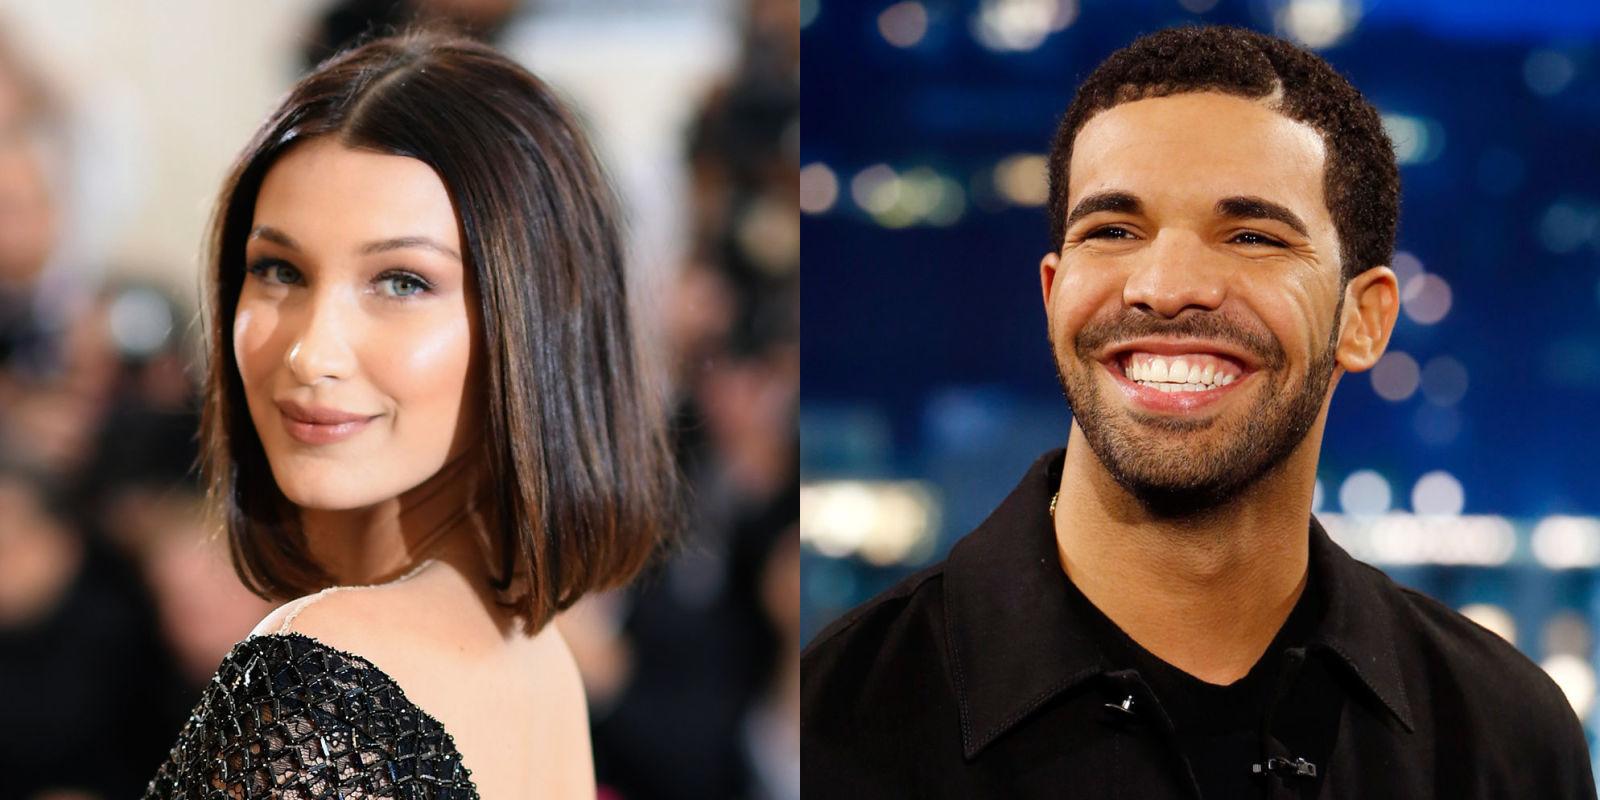 Are Bella Hadid and Drake a THING?